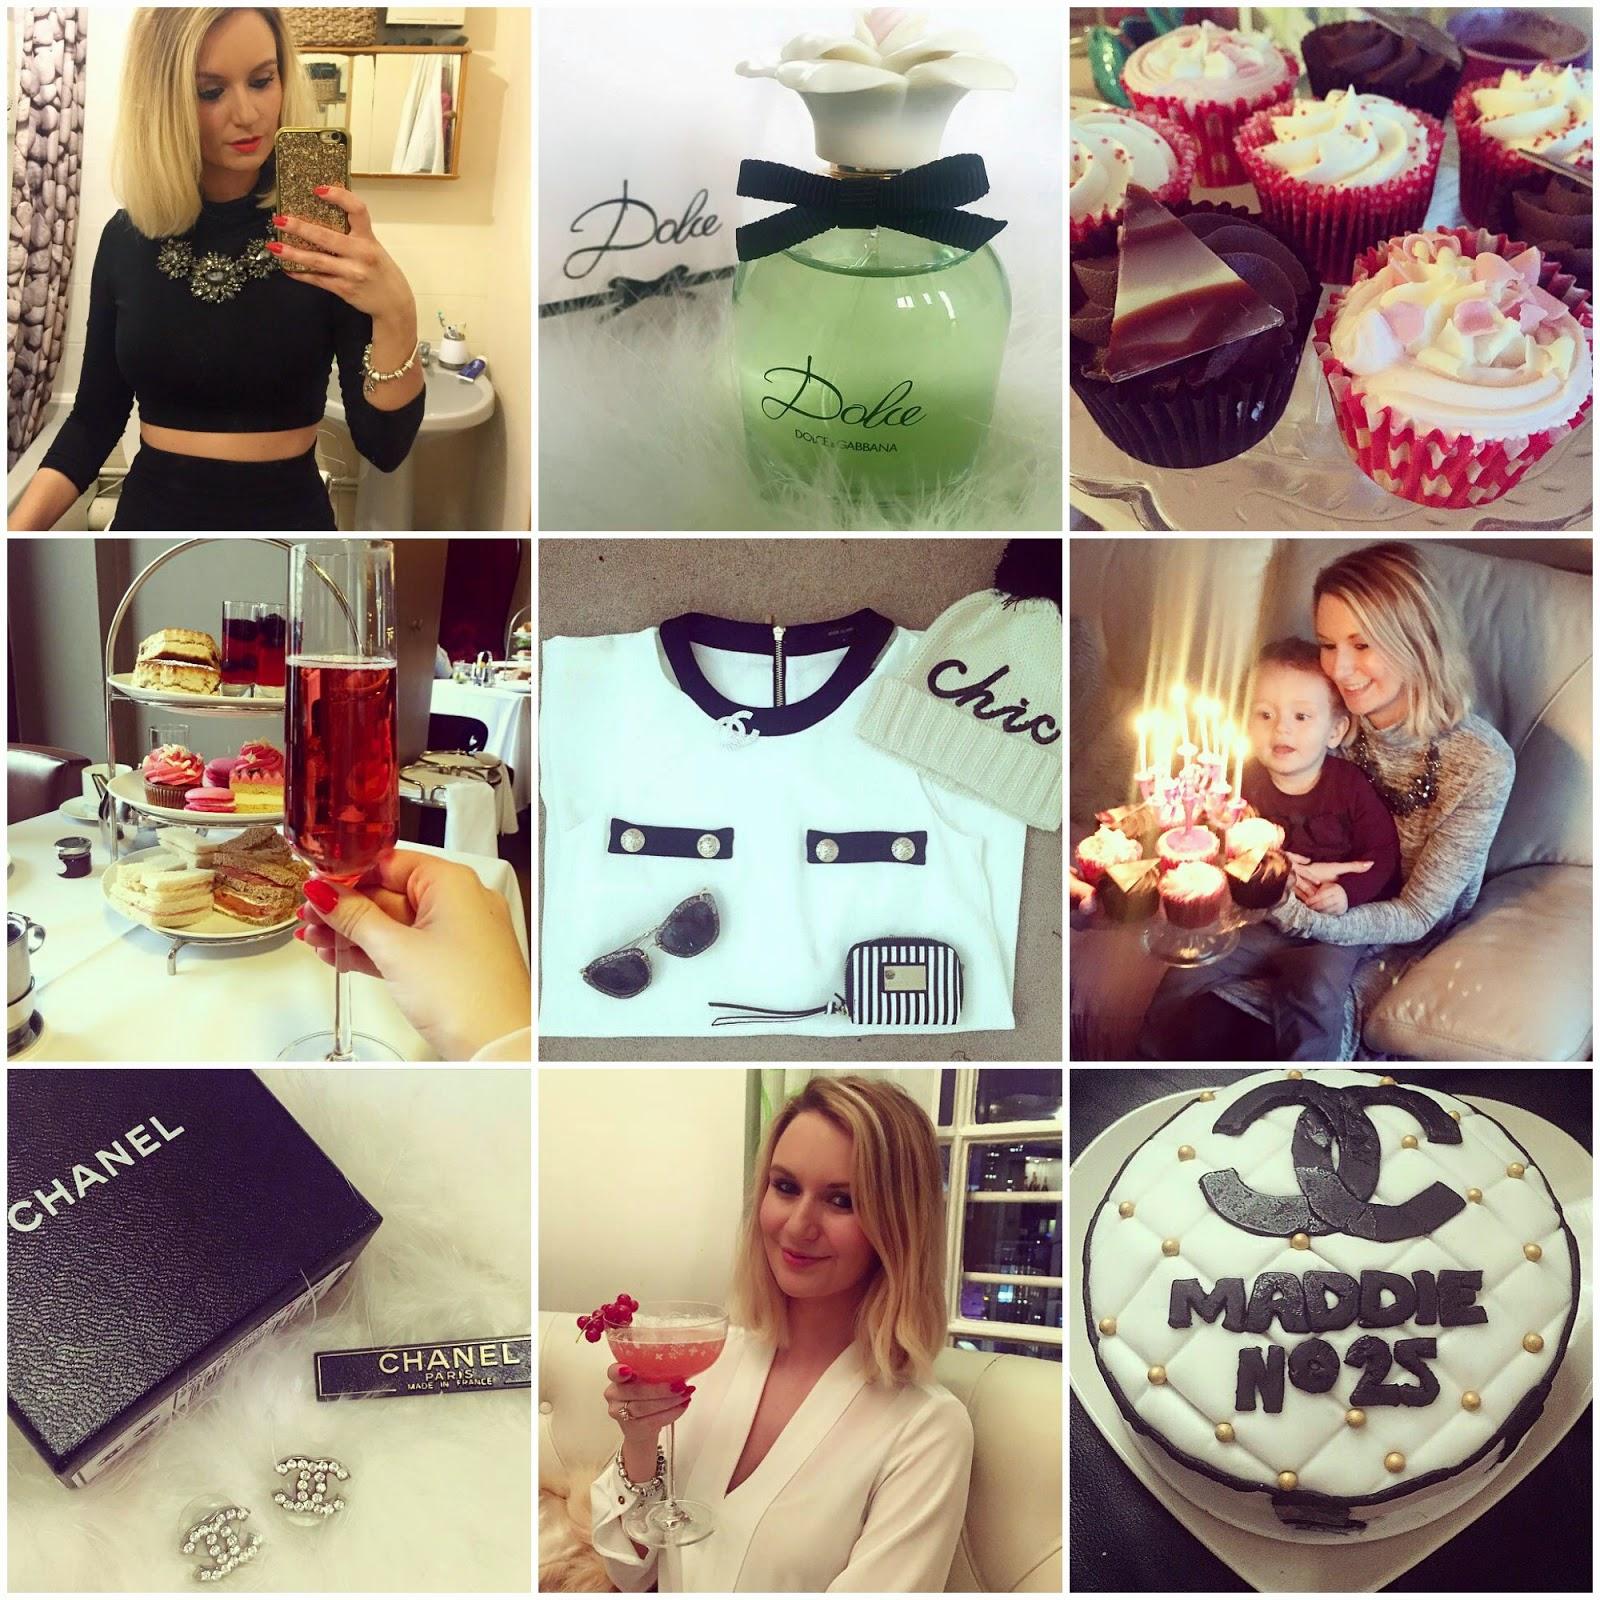 LIFESTYLE: Happy Highlights from my Week, lifestyle, my week in pictures, my month in pictures, lifestyle blogger, modemadeleine, photo montage, memories